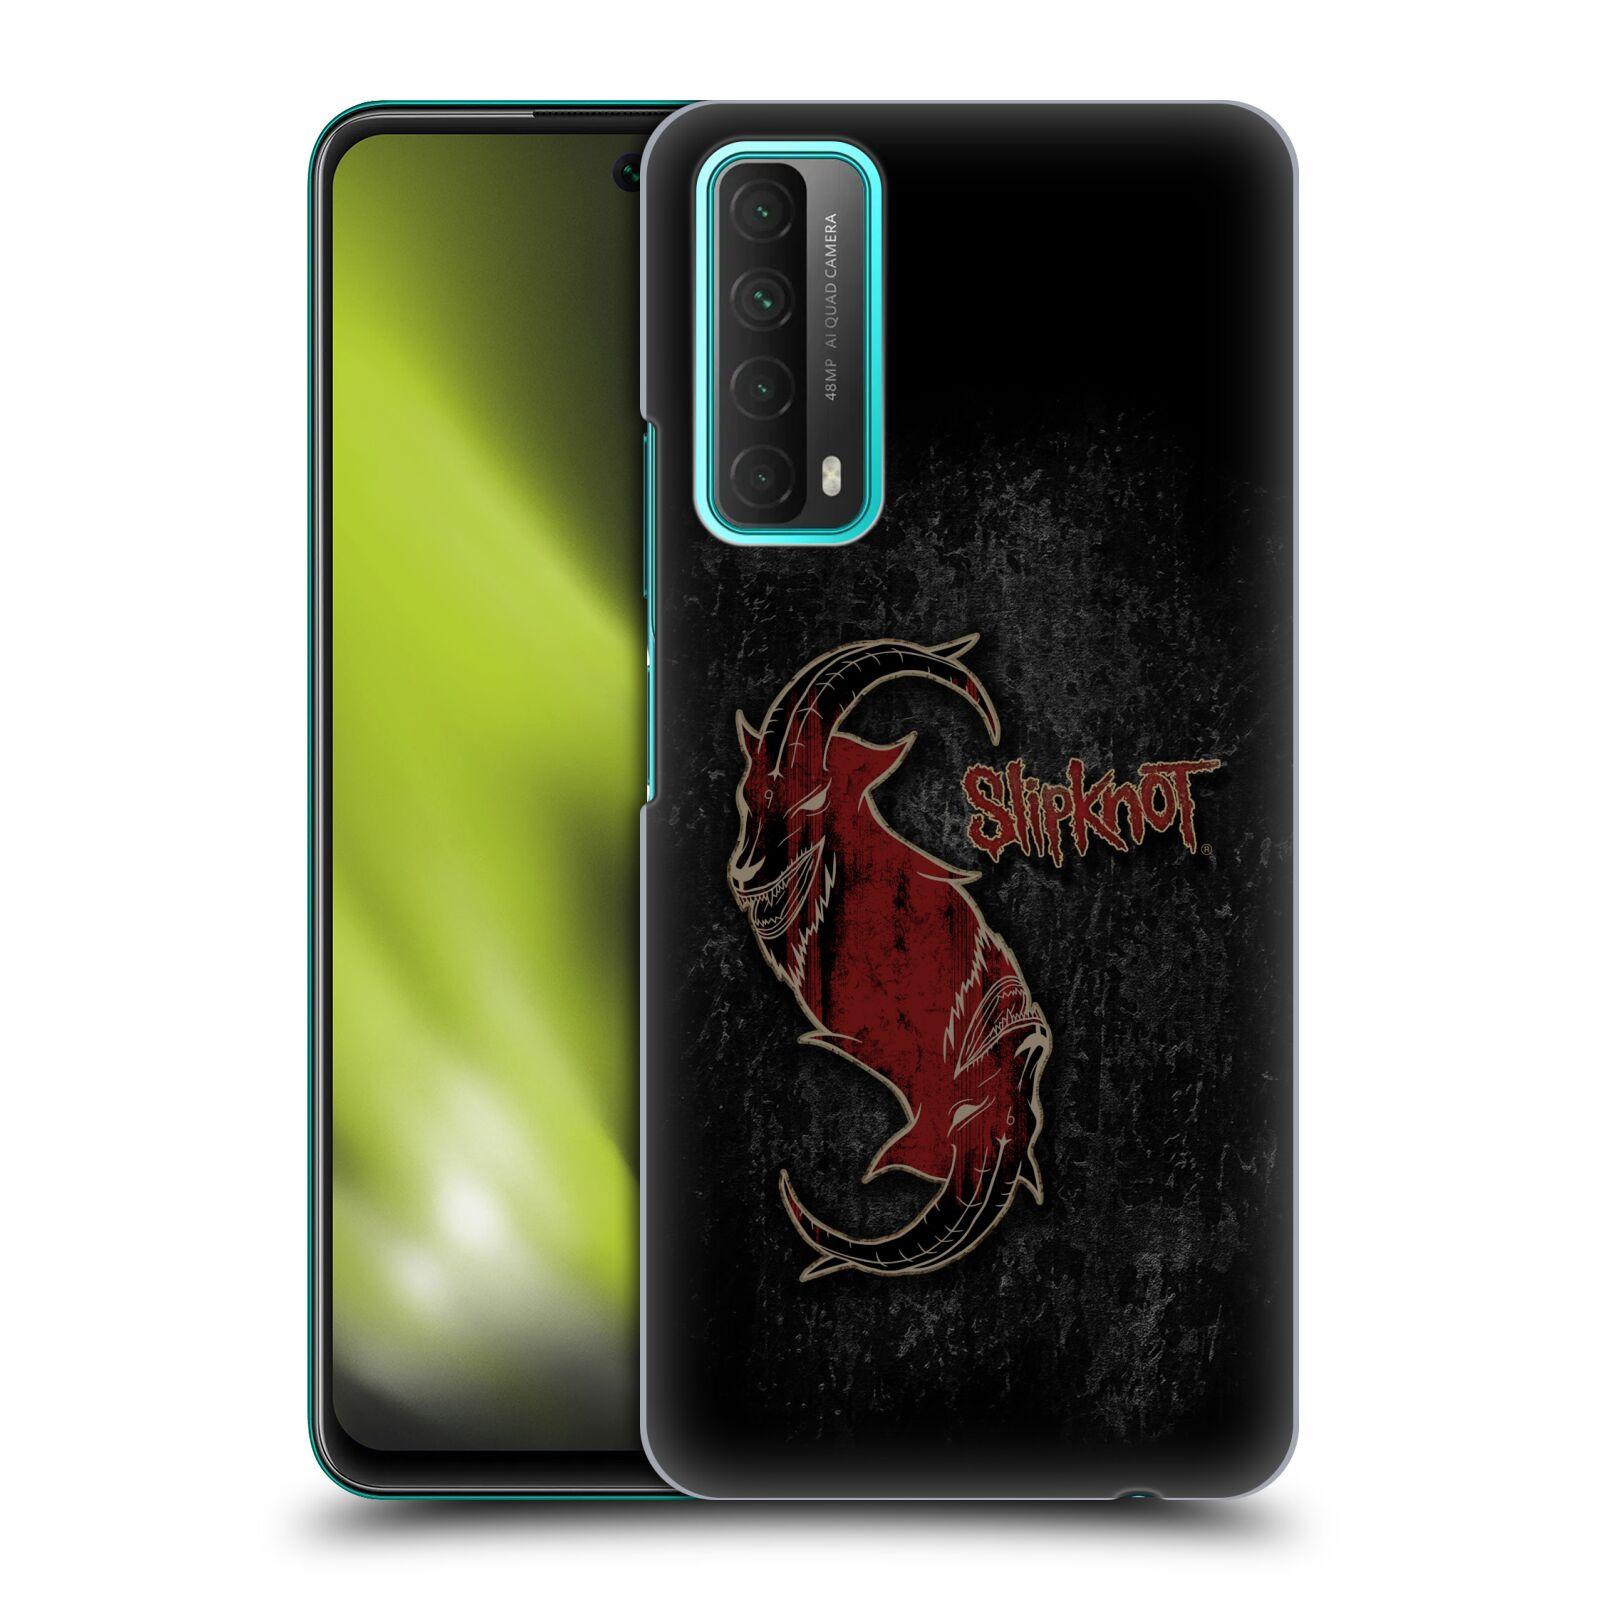 Plastové pouzdro na mobil Huawei P Smart (2021) - Head Case - Slipknot - Rudý kozel